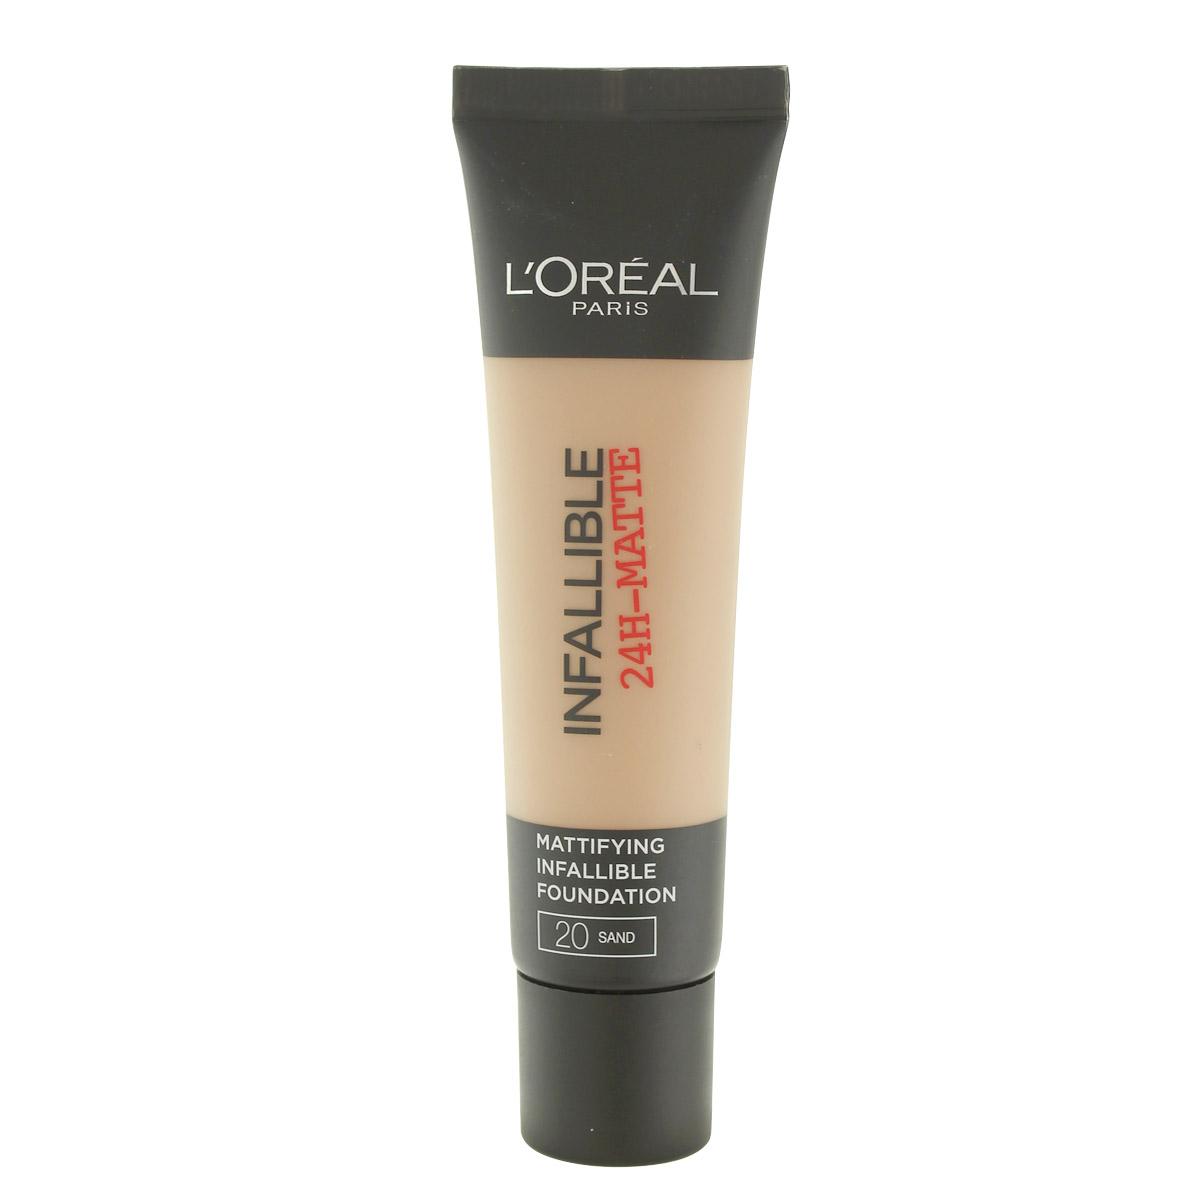 L´Oreal Paris Infallible 24H-Matte make-up (20 Sand) 30 ml